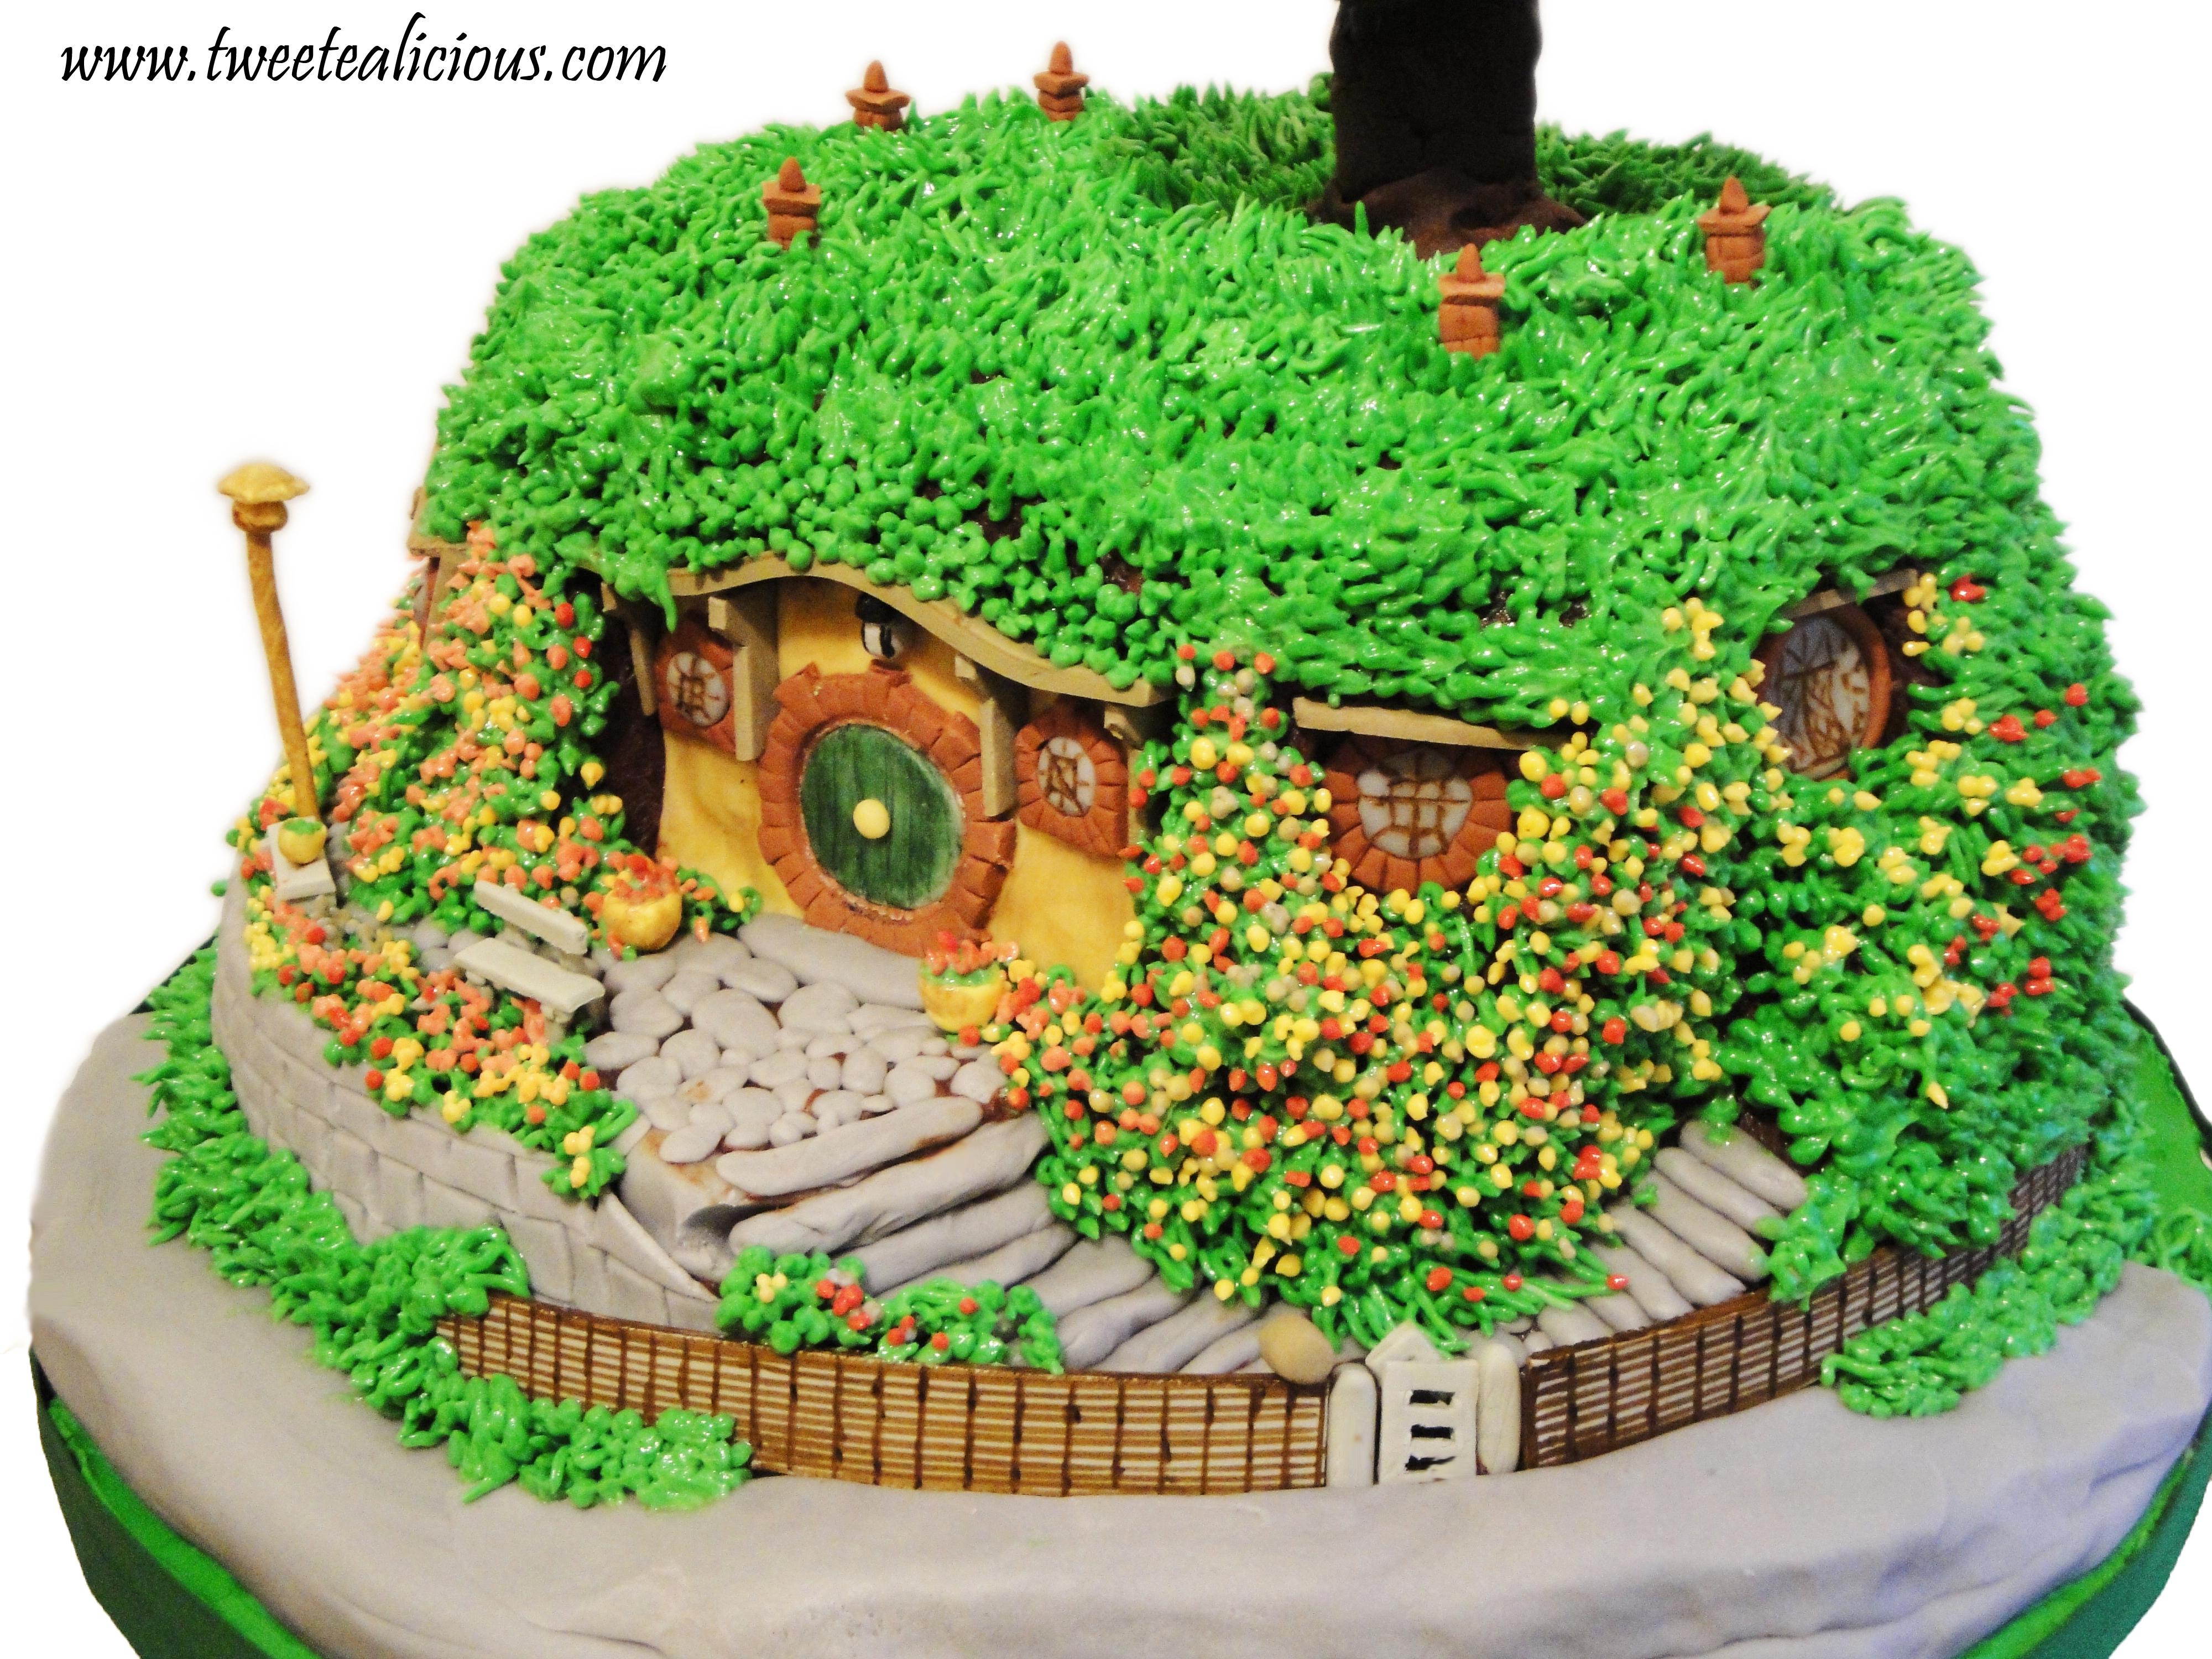 Lord Of The Rings Bag End Cake Twee Tea Licious